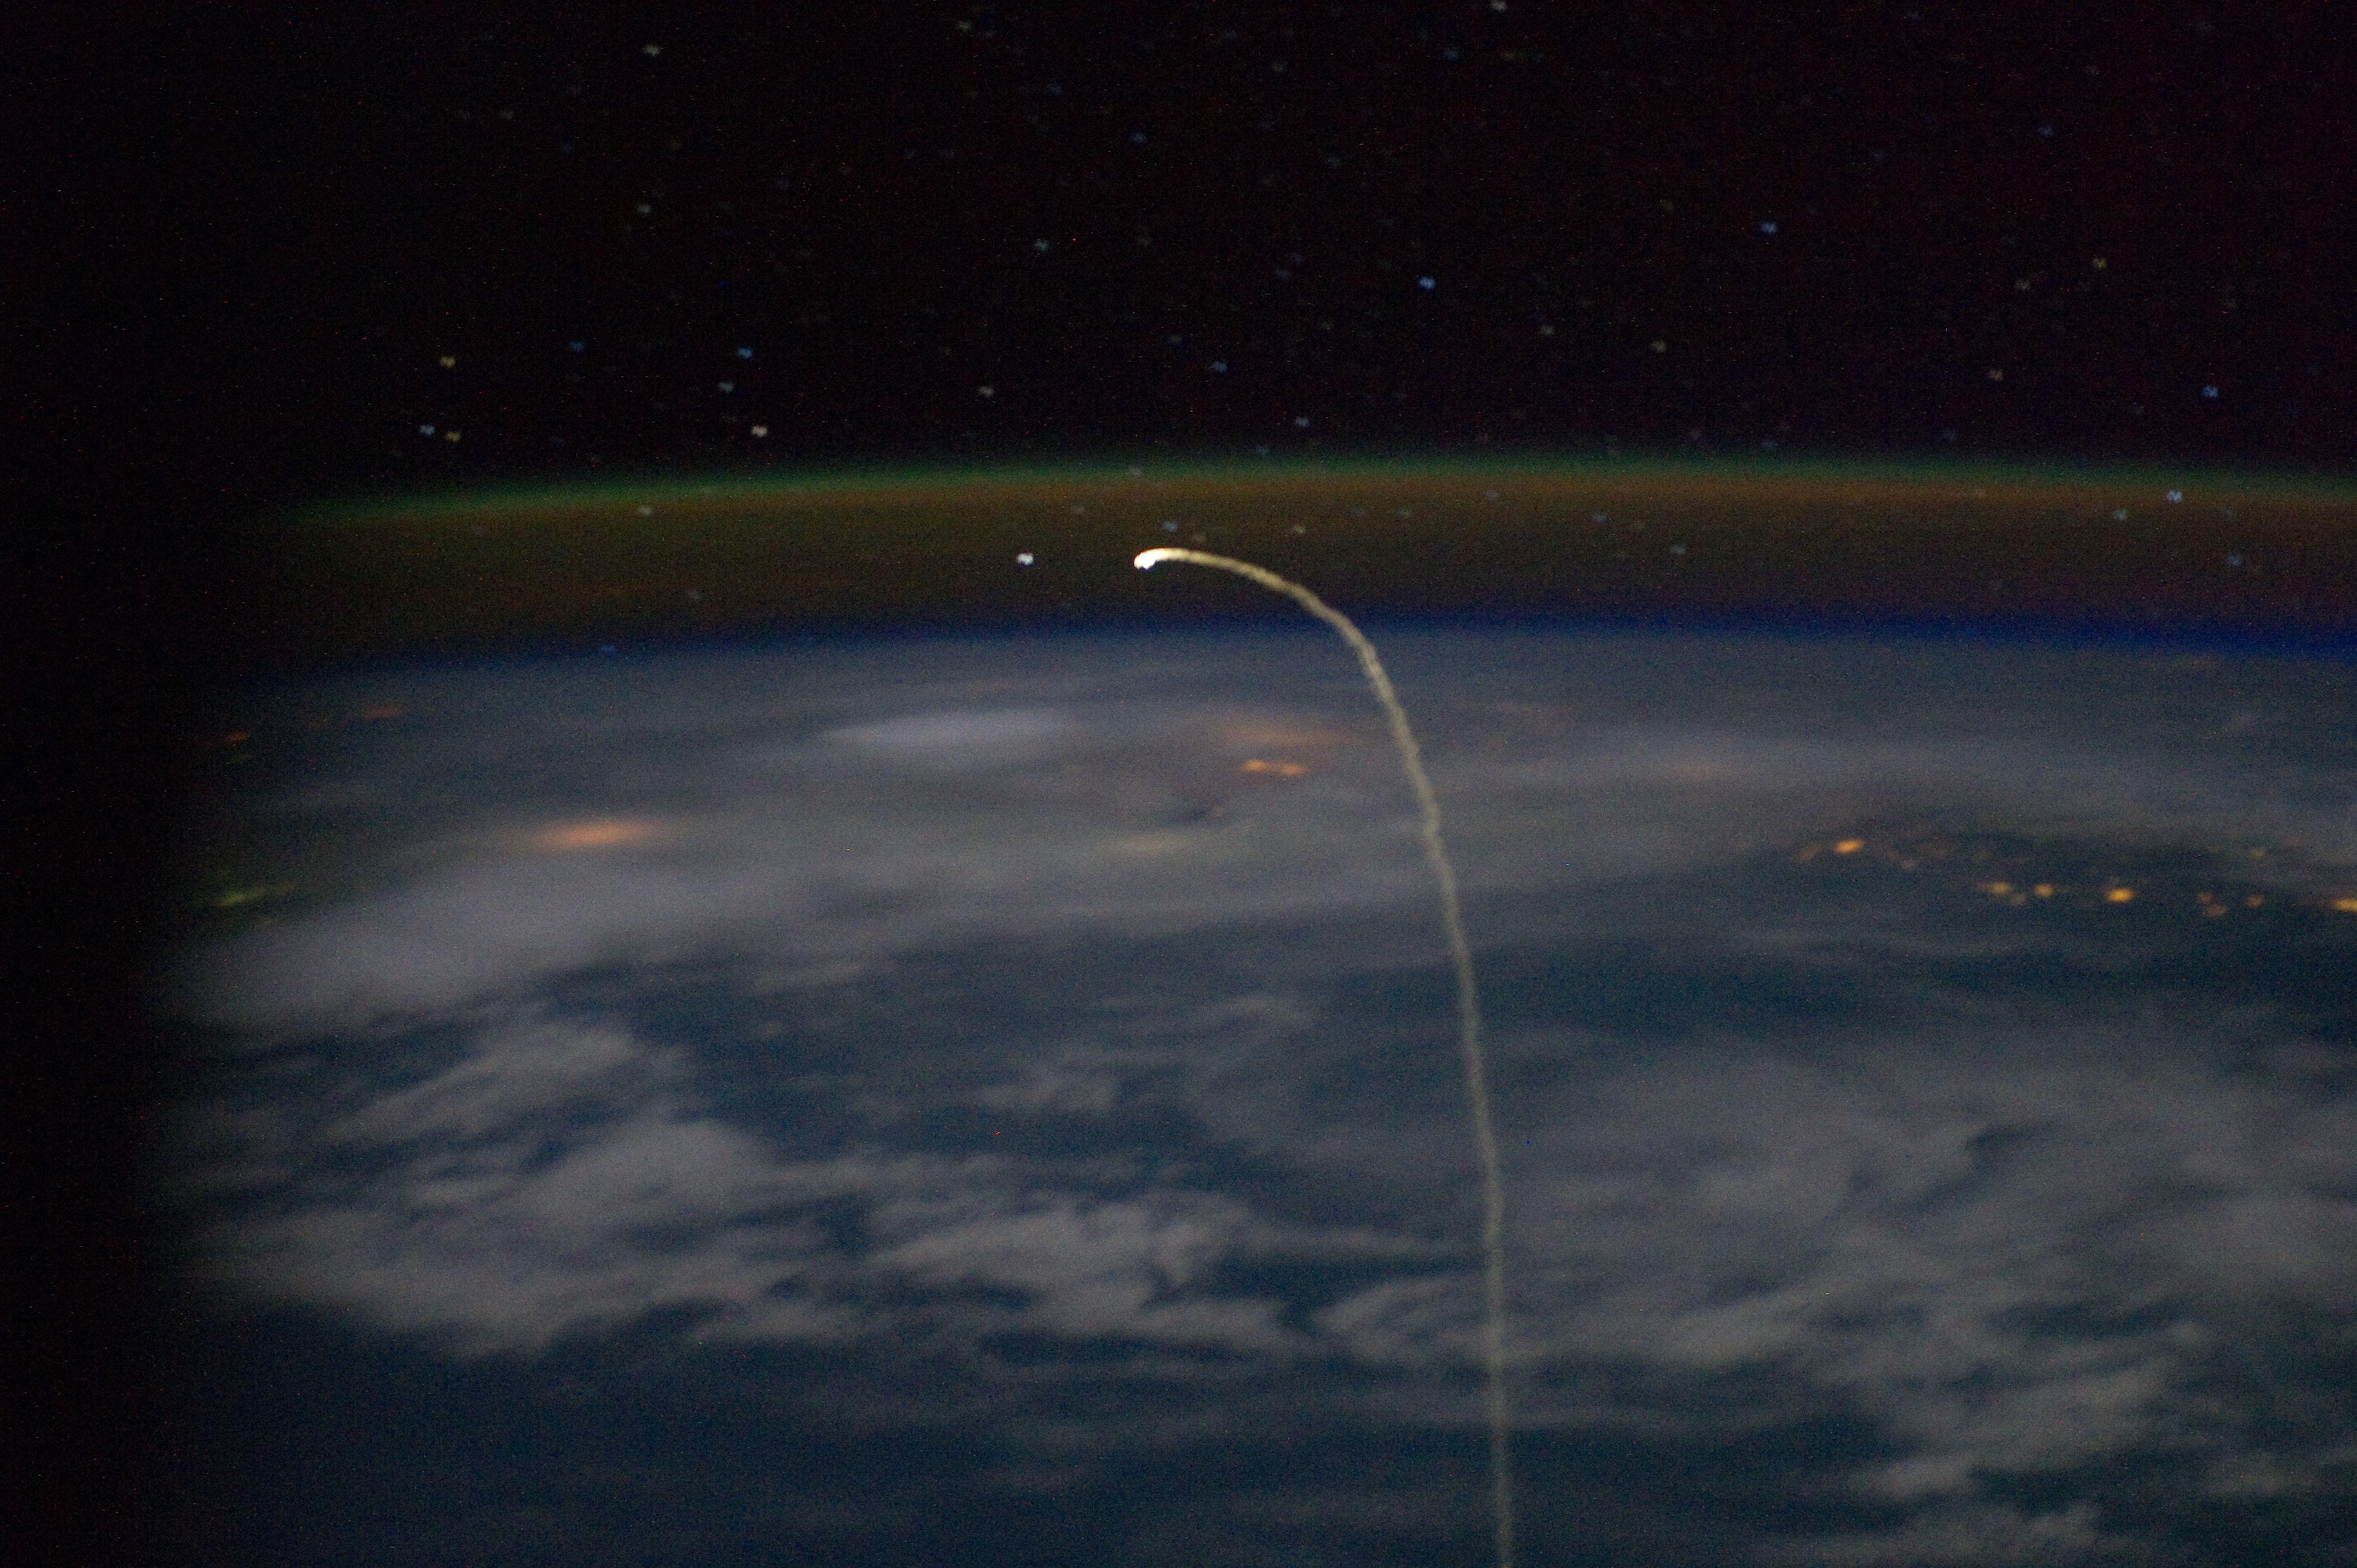 space shuttle atlantis reentry - photo #1